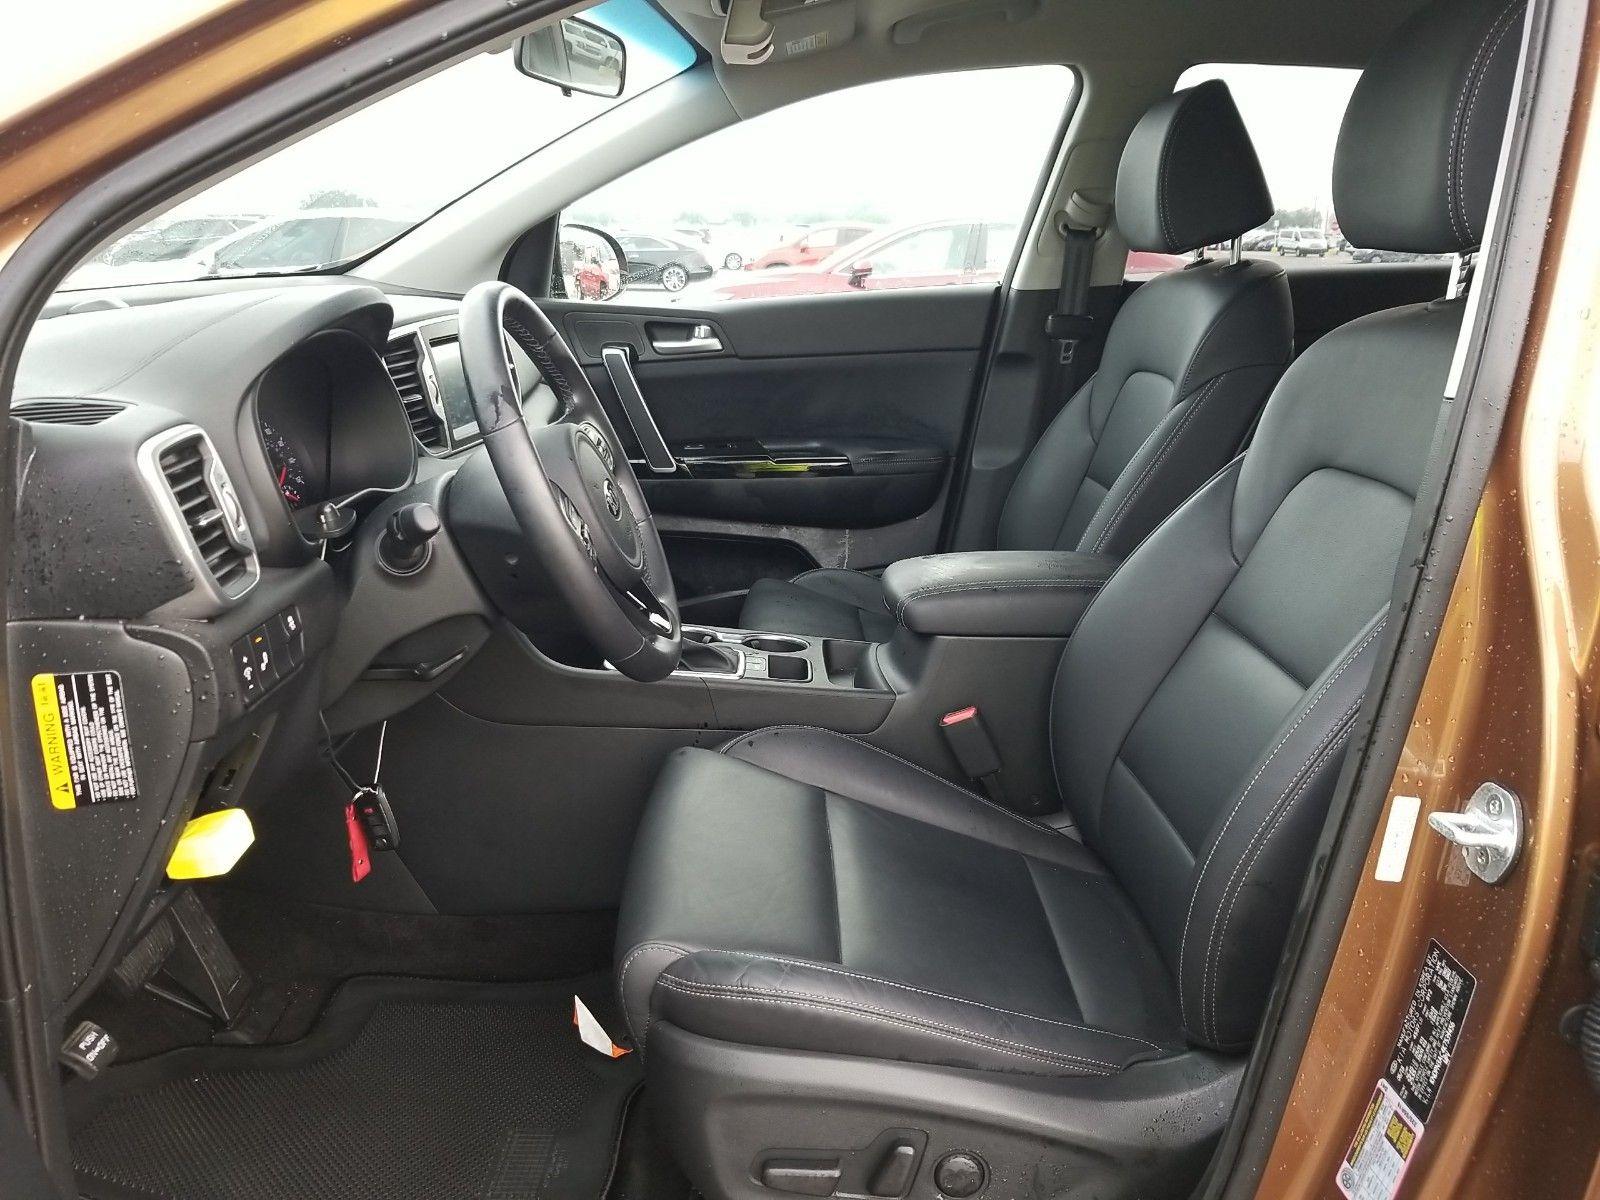 2019 KIA SPORTAGE FWD 4C EX - 7